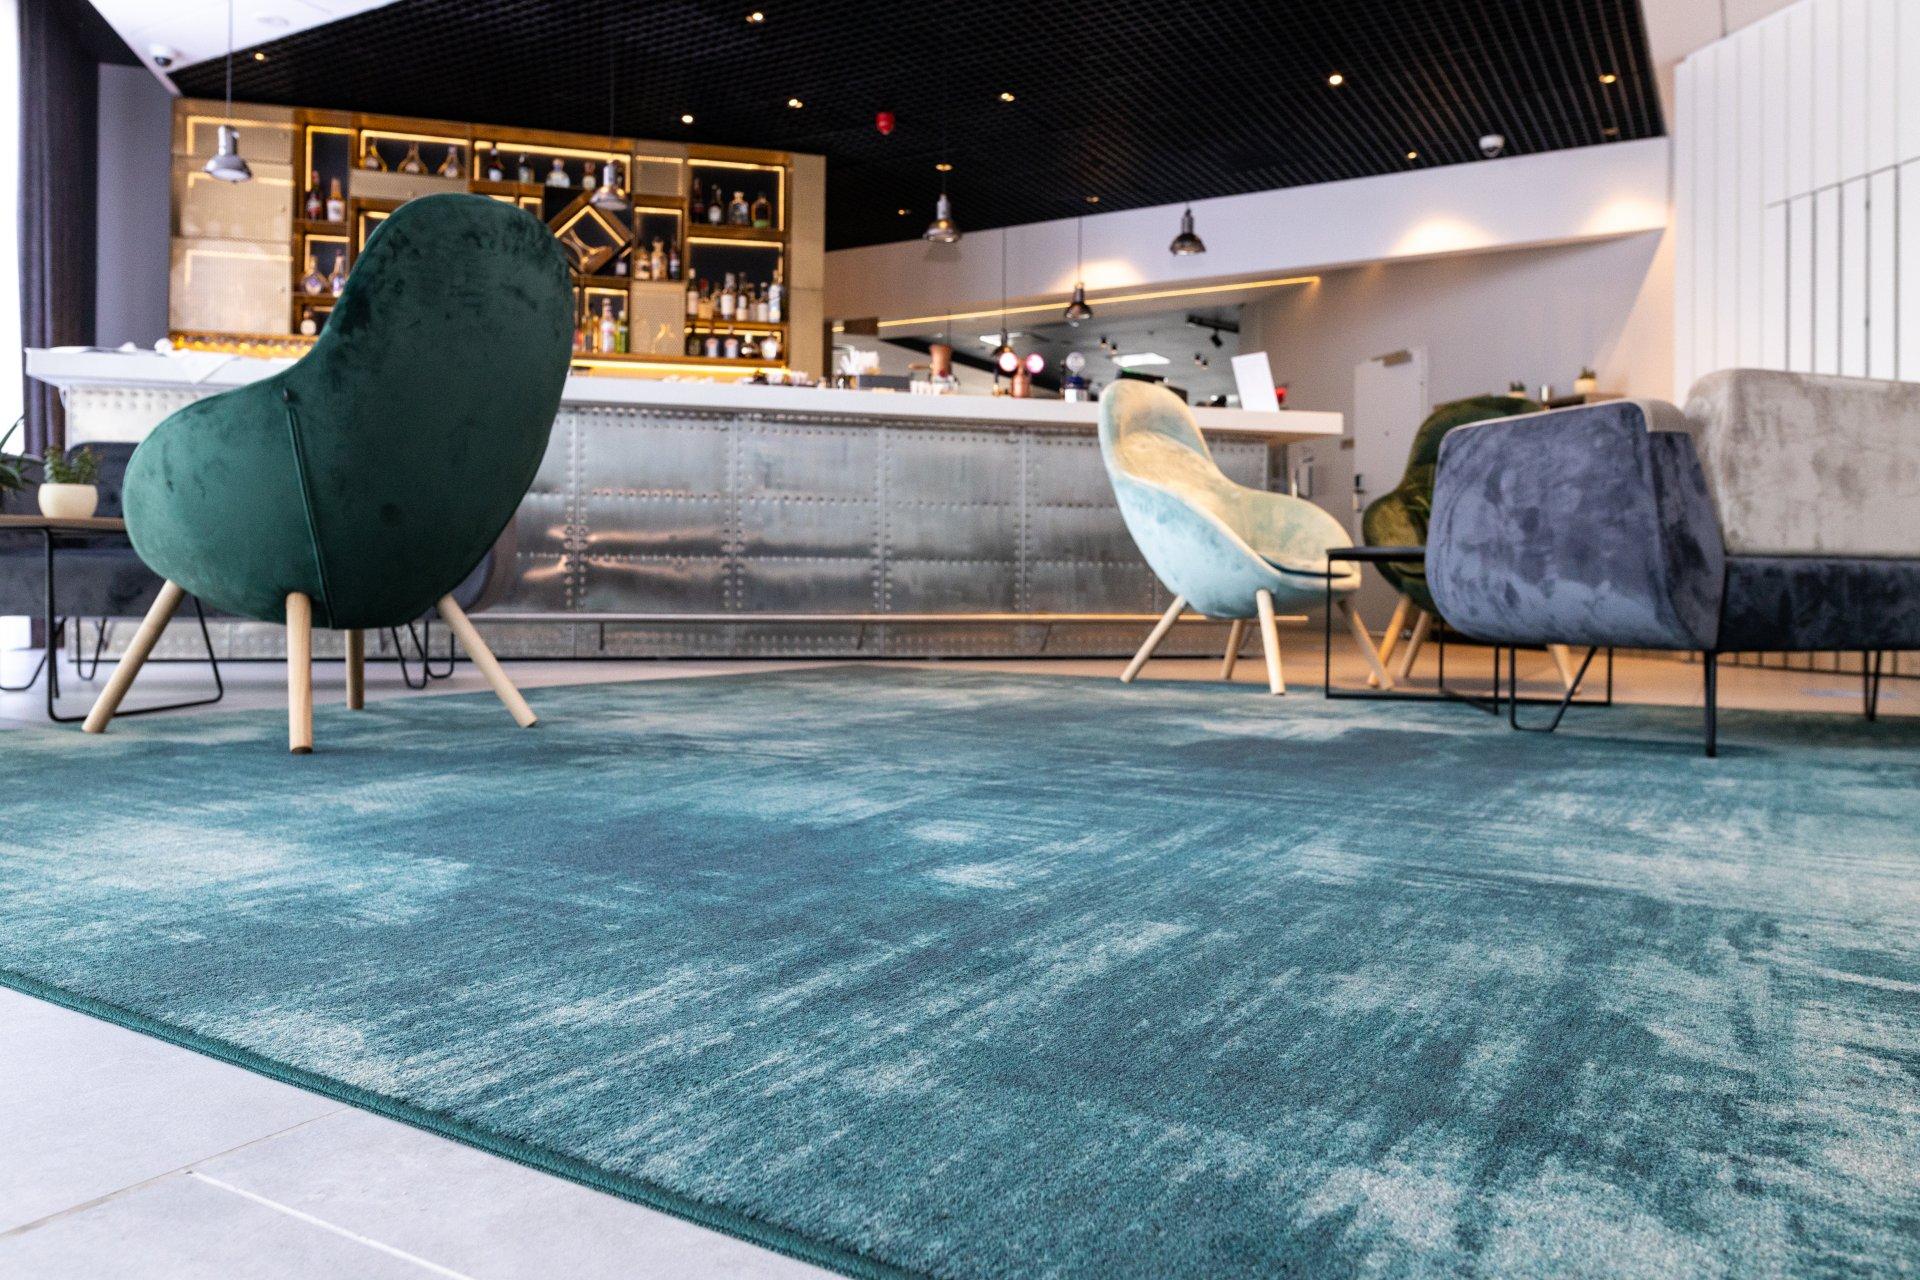 20200625-carpet-and-more-hilton-otopeni-35